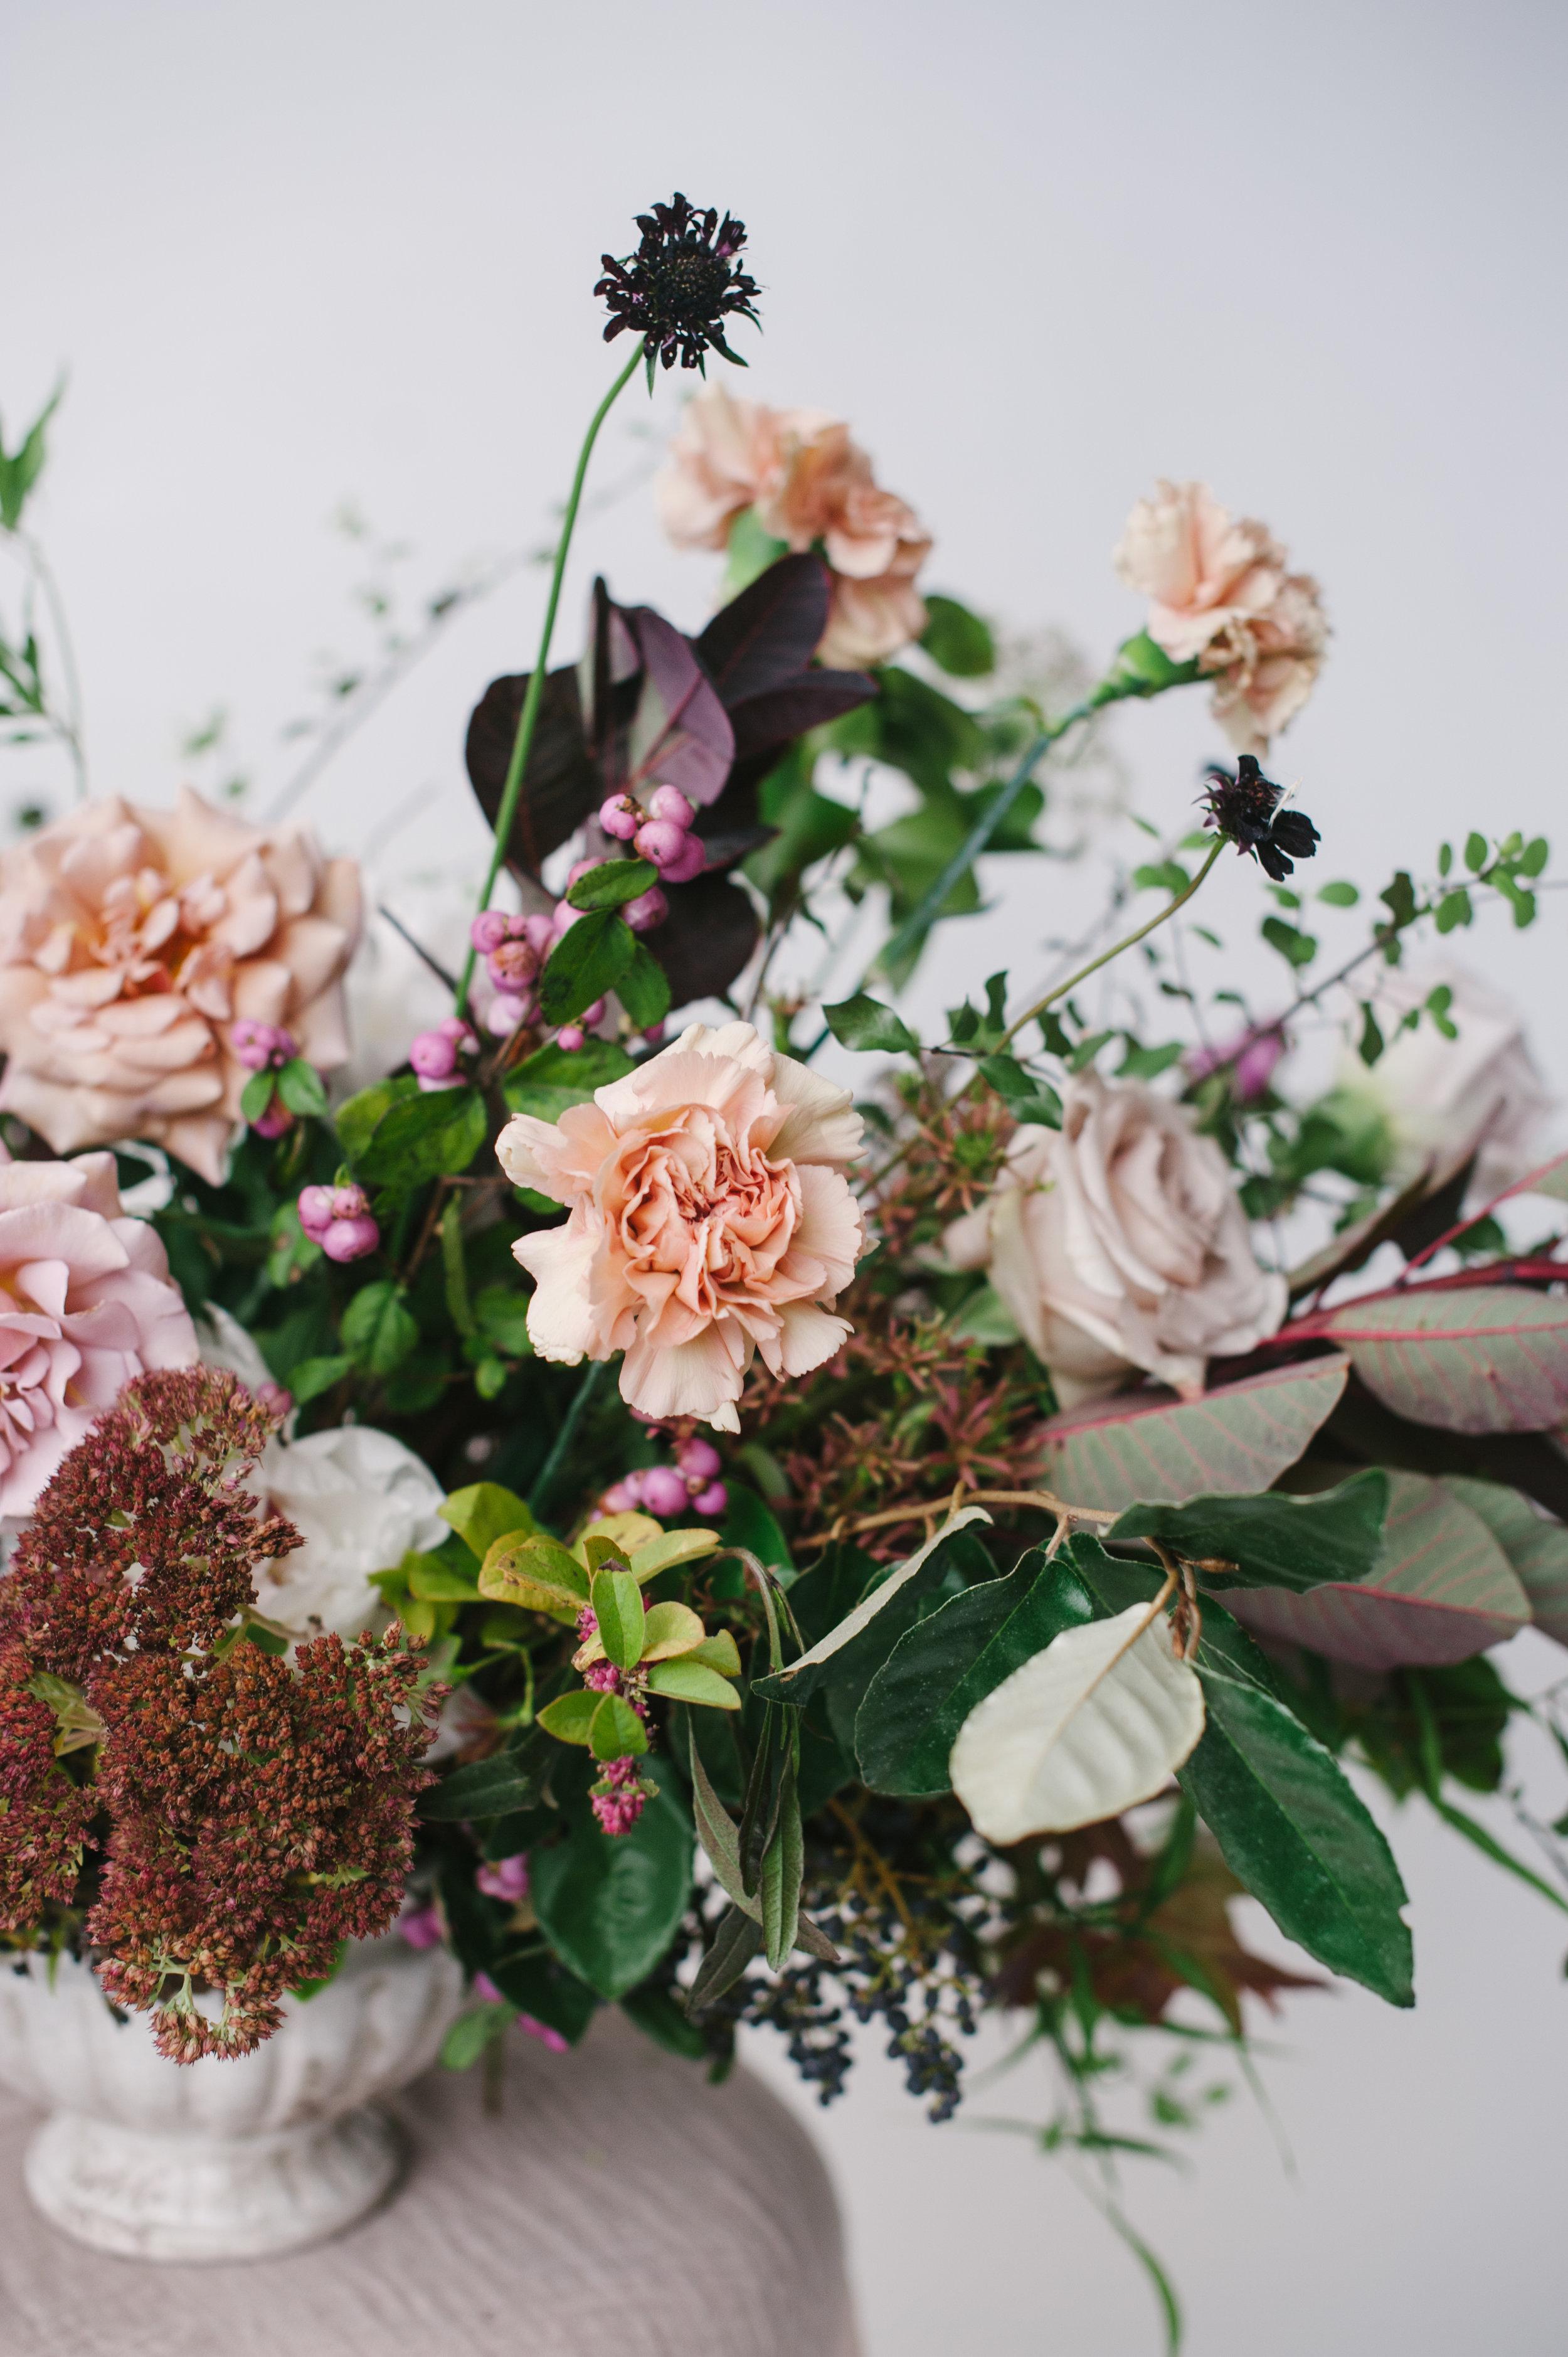 dark-moody-floral-arrangement-urban-marigold-3.JPG